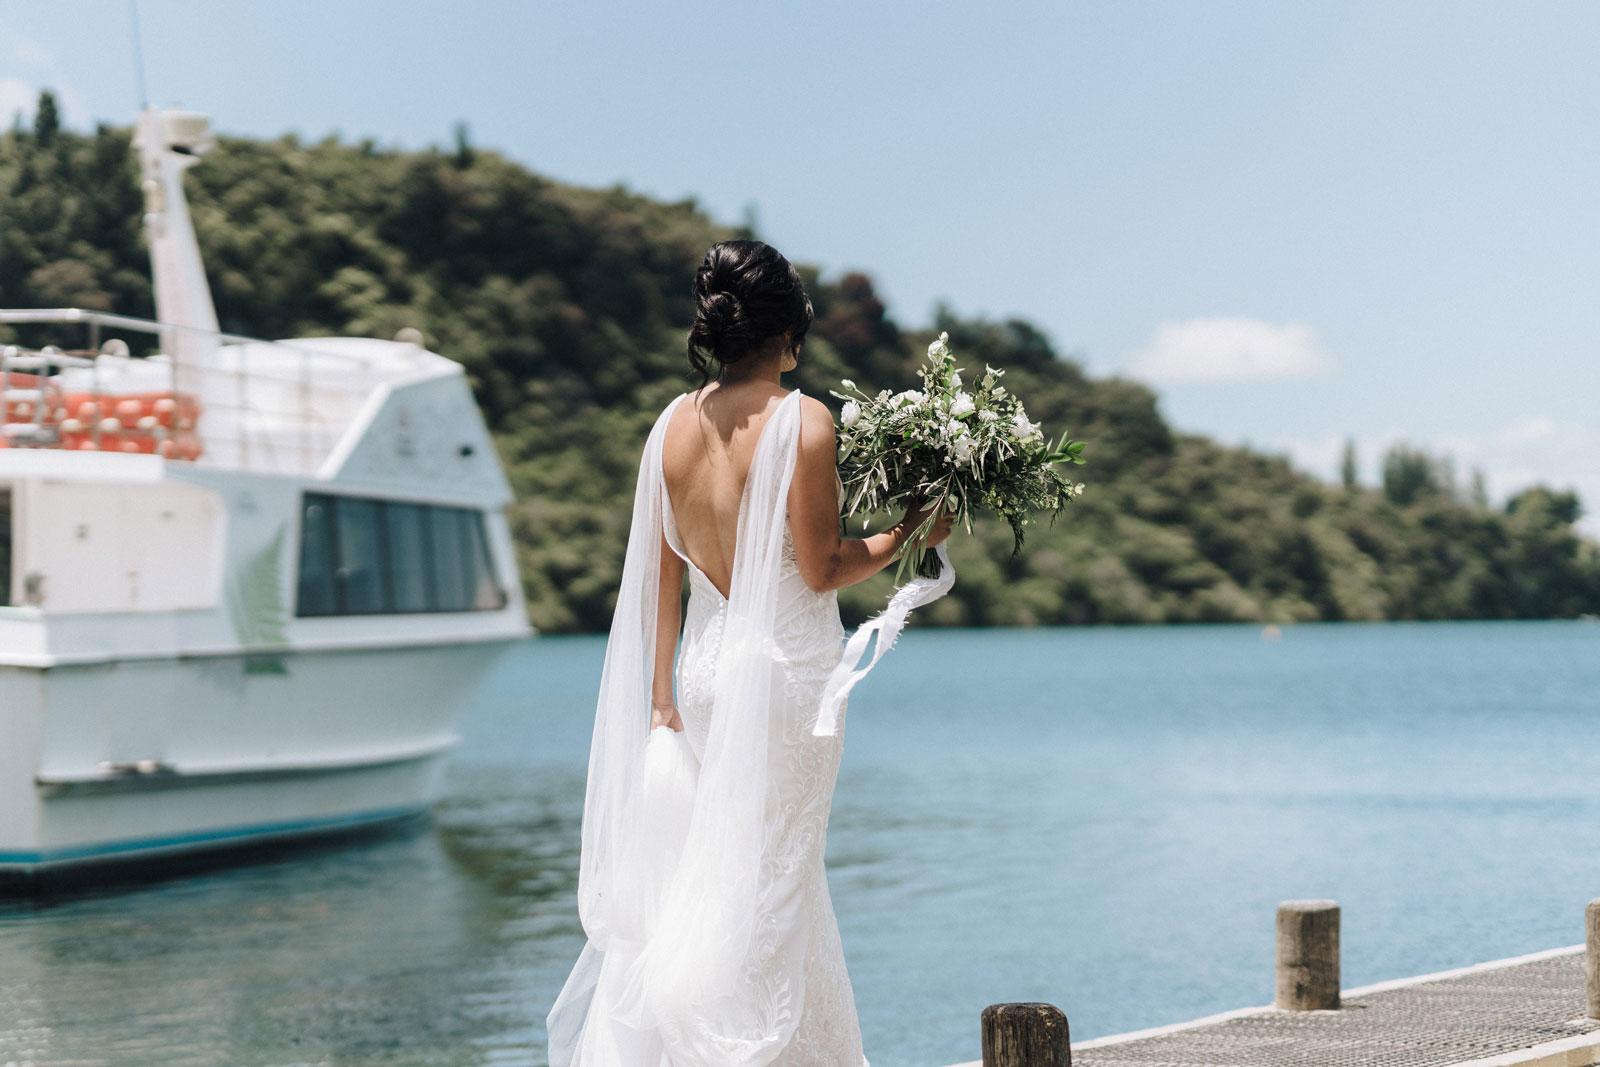 newfound-n-w-black-barn-tarawera-rotorua-wedding-photographer-240